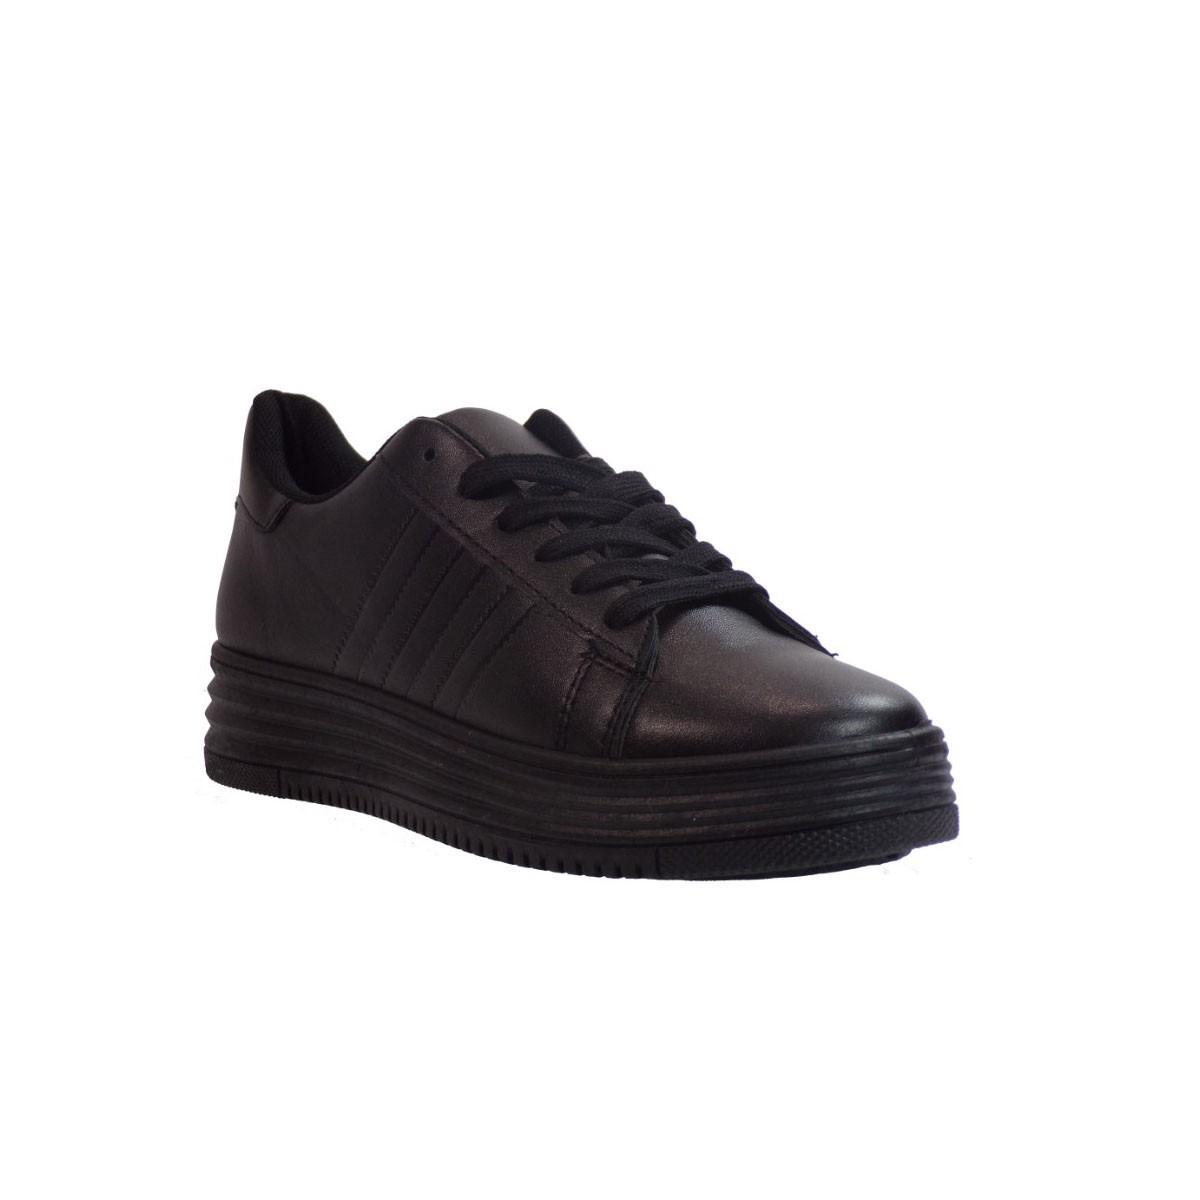 Bagiota shoes Sneakers Παπούτσια Γυναικεία DSY352 Μαύρο Bagiota shoes DSY352 M